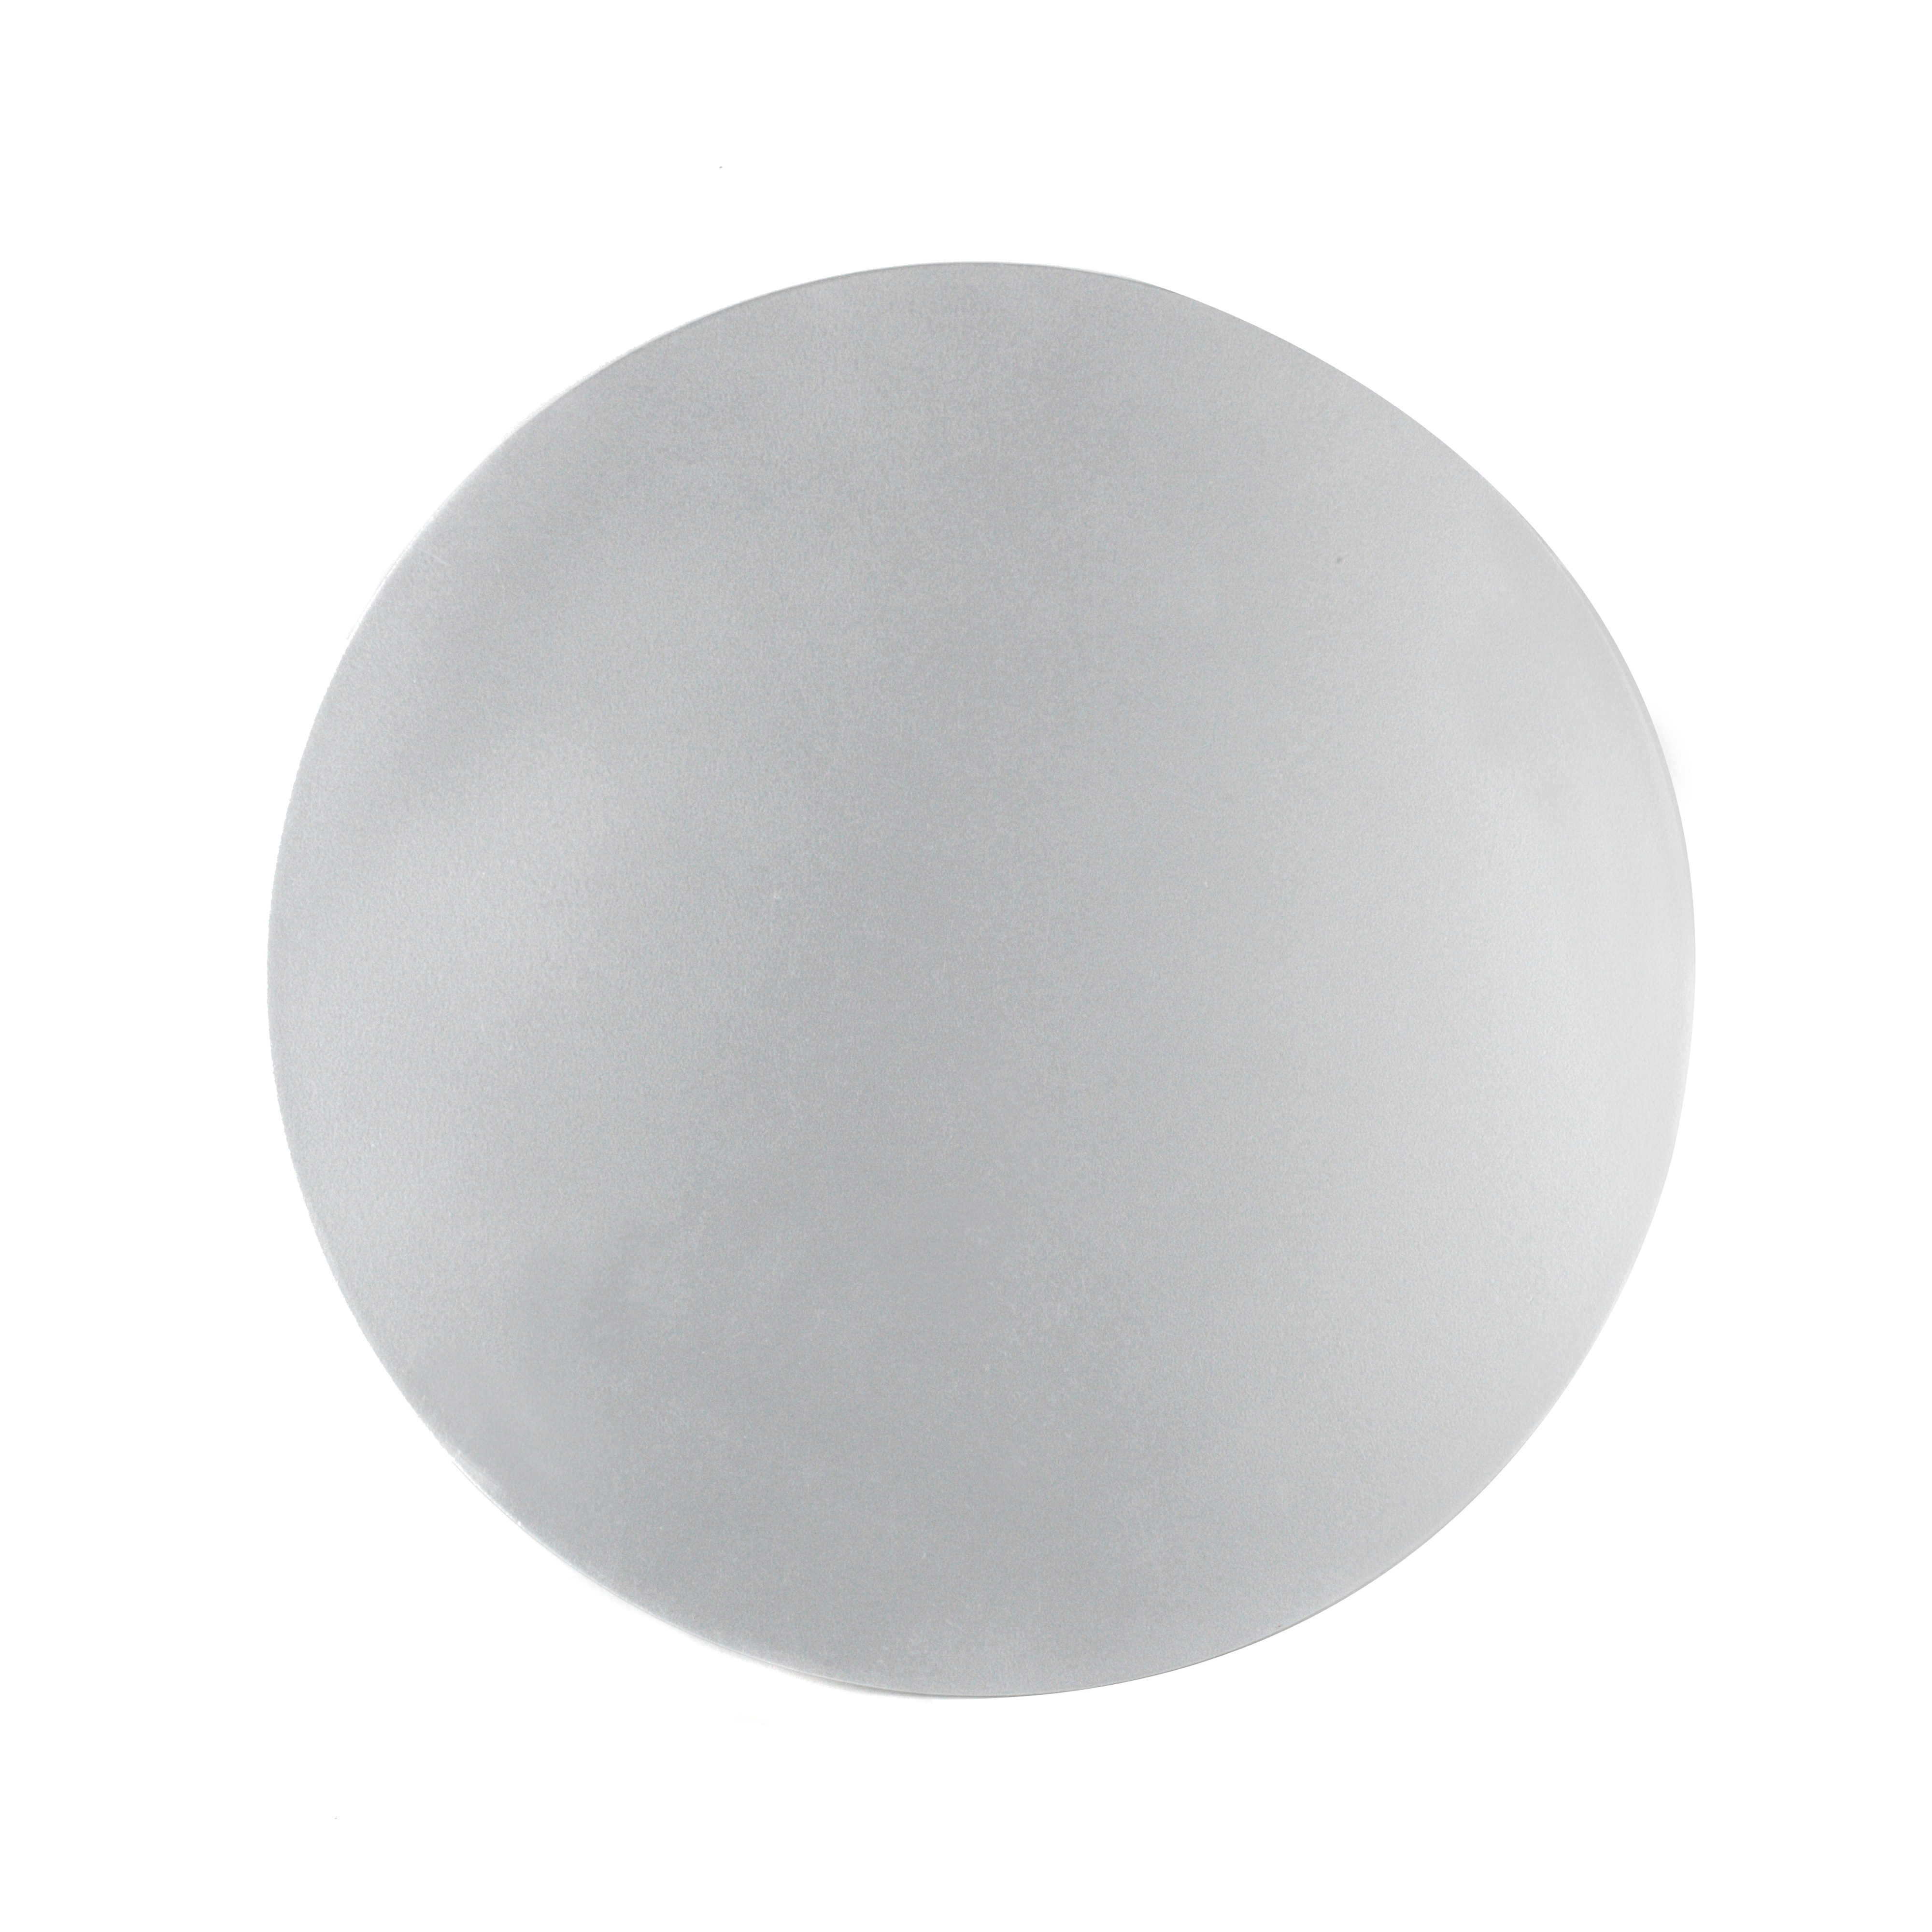 Inspire Luxury Shimmer Metallic Round Placemat 29cm Mdf Silver